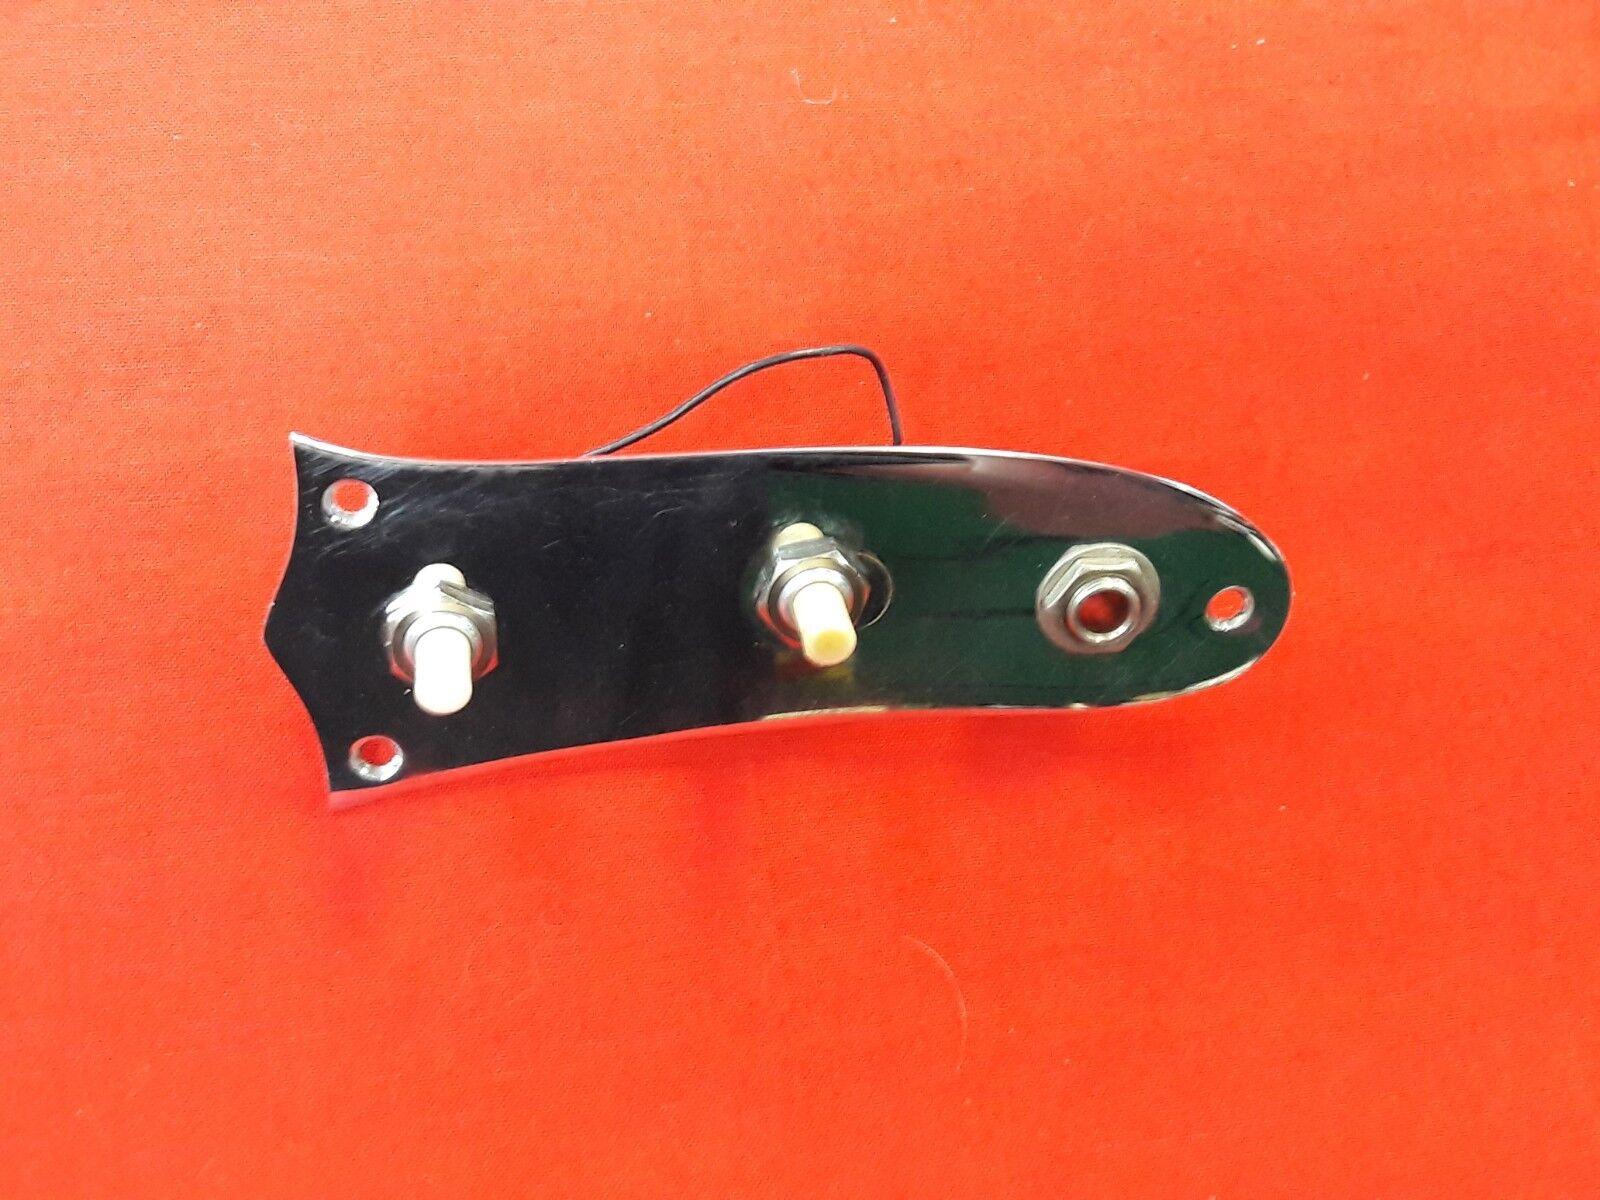 Klassischer 1974 USA Fender Präzision Bass Gitarre Kabelbaum Telecaster Töpfe